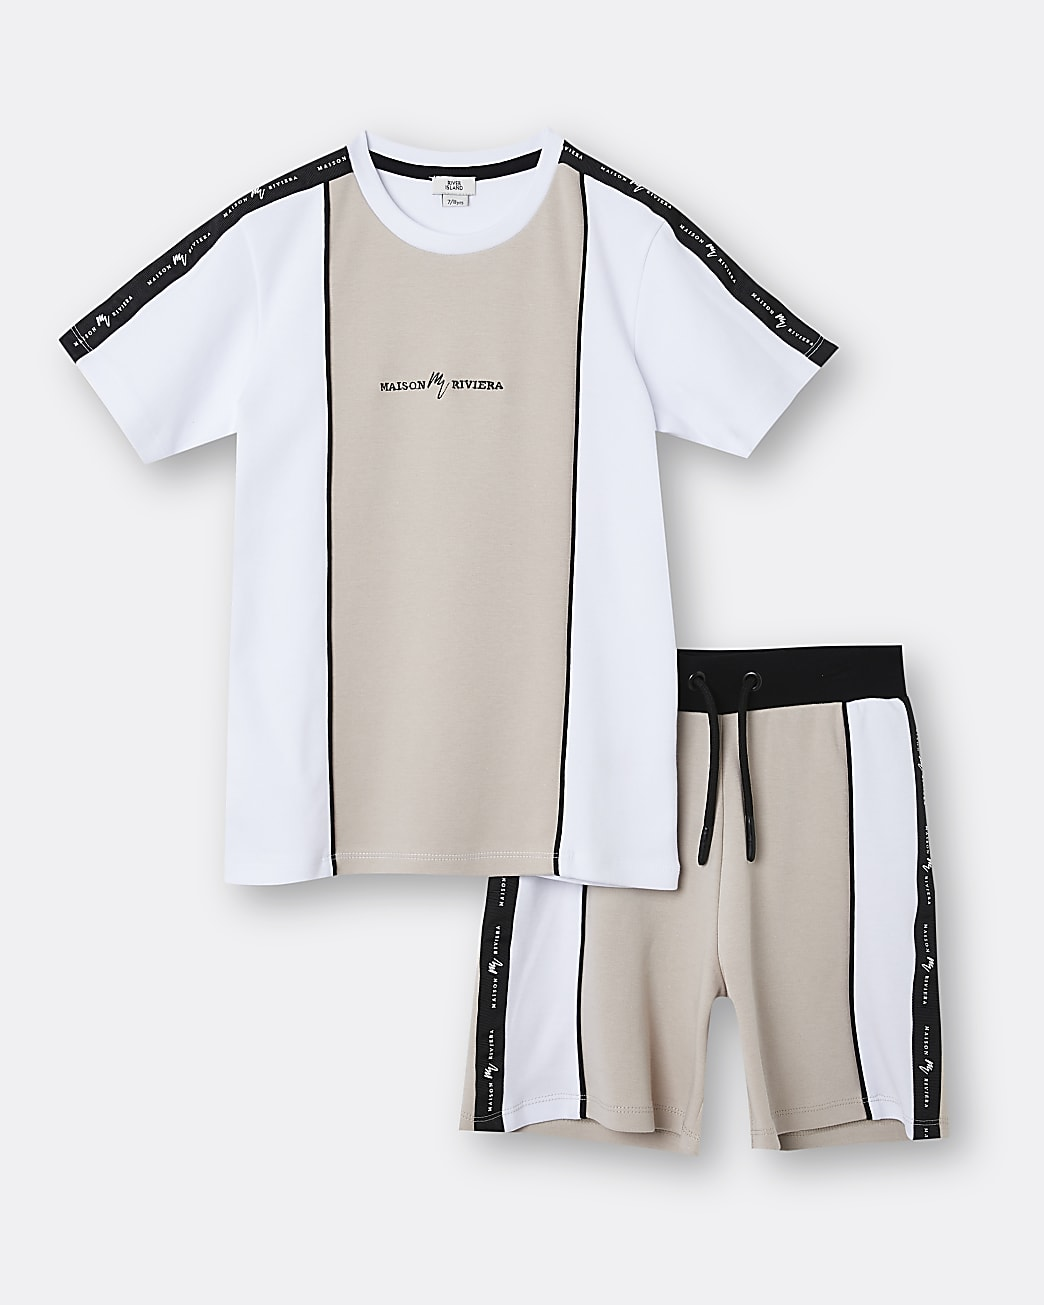 Boys stone Maison Riviera t-shirt outfit